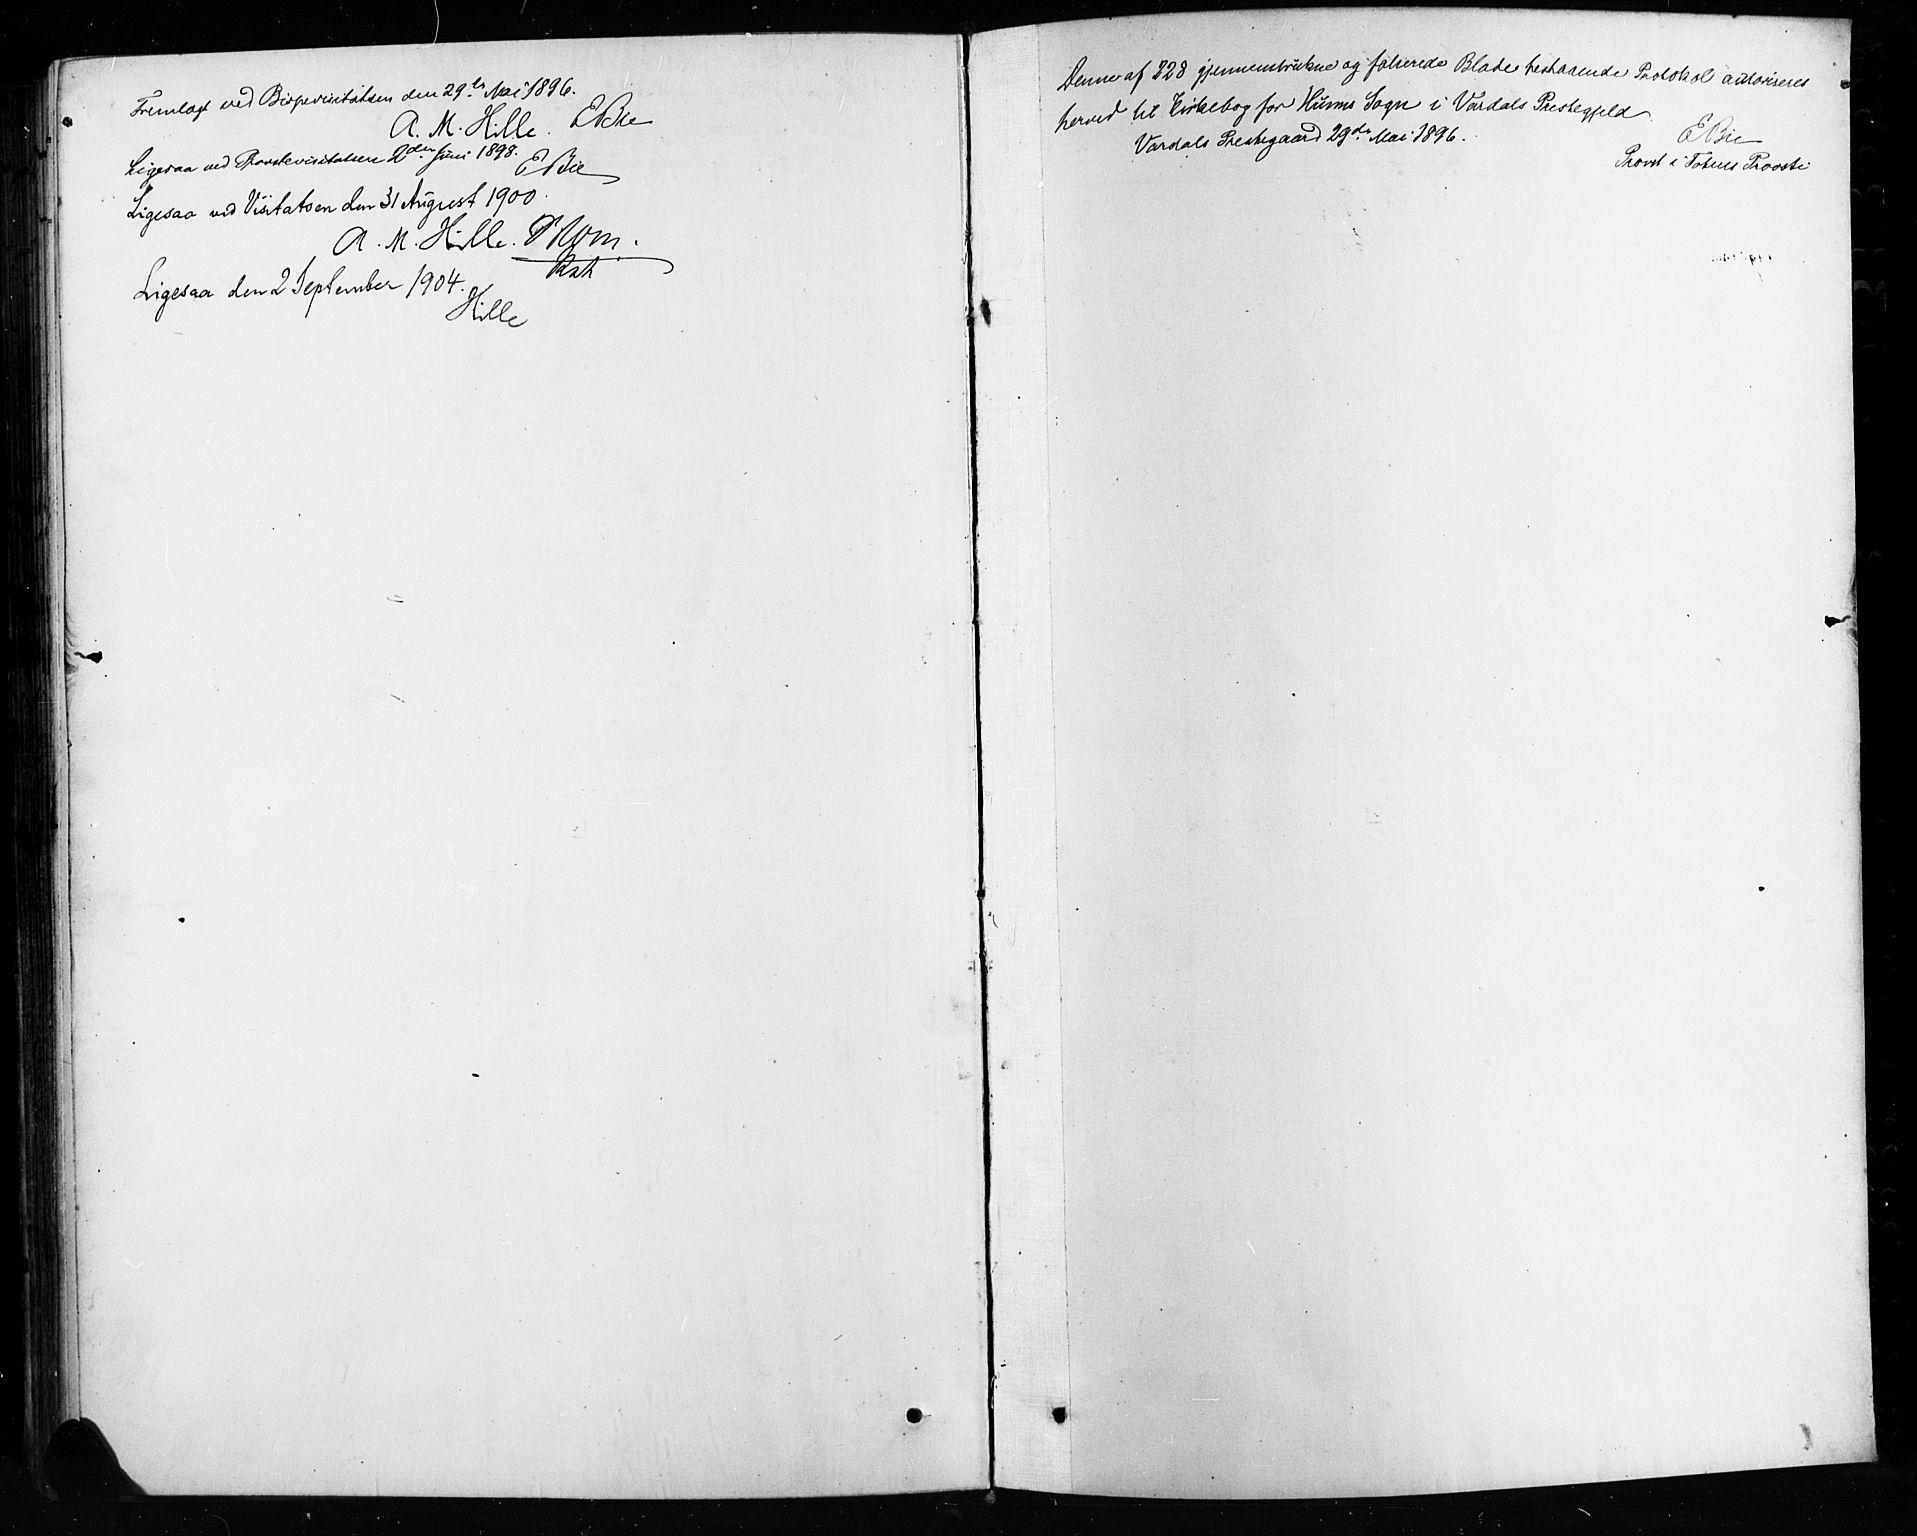 SAH, Vardal prestekontor, H/Ha/Hab/L0010: Klokkerbok nr. 10, 1895-1903